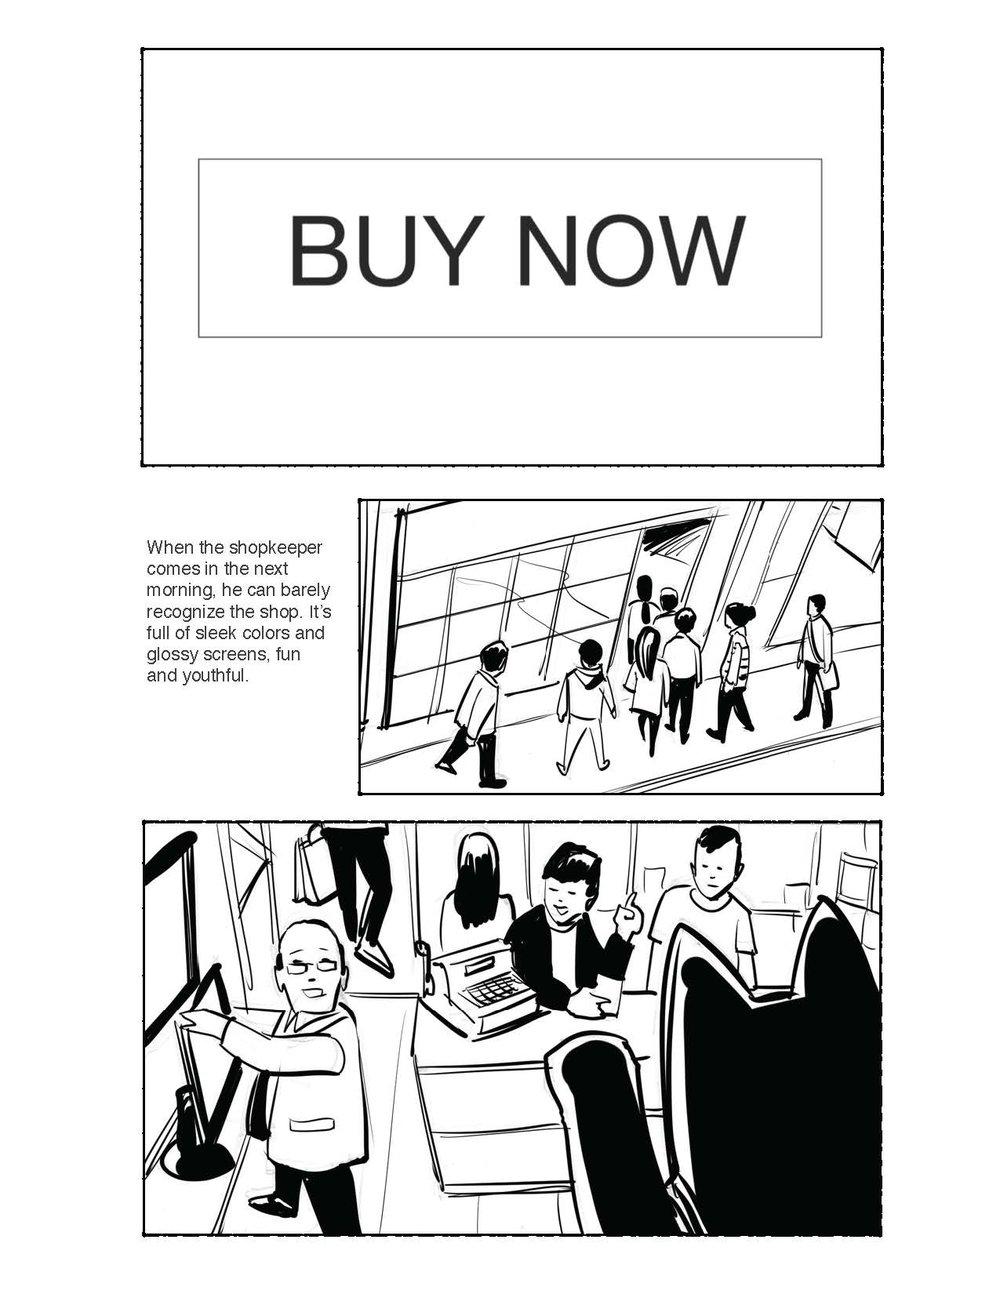 Storyboard HKTDC_Page_11.jpg